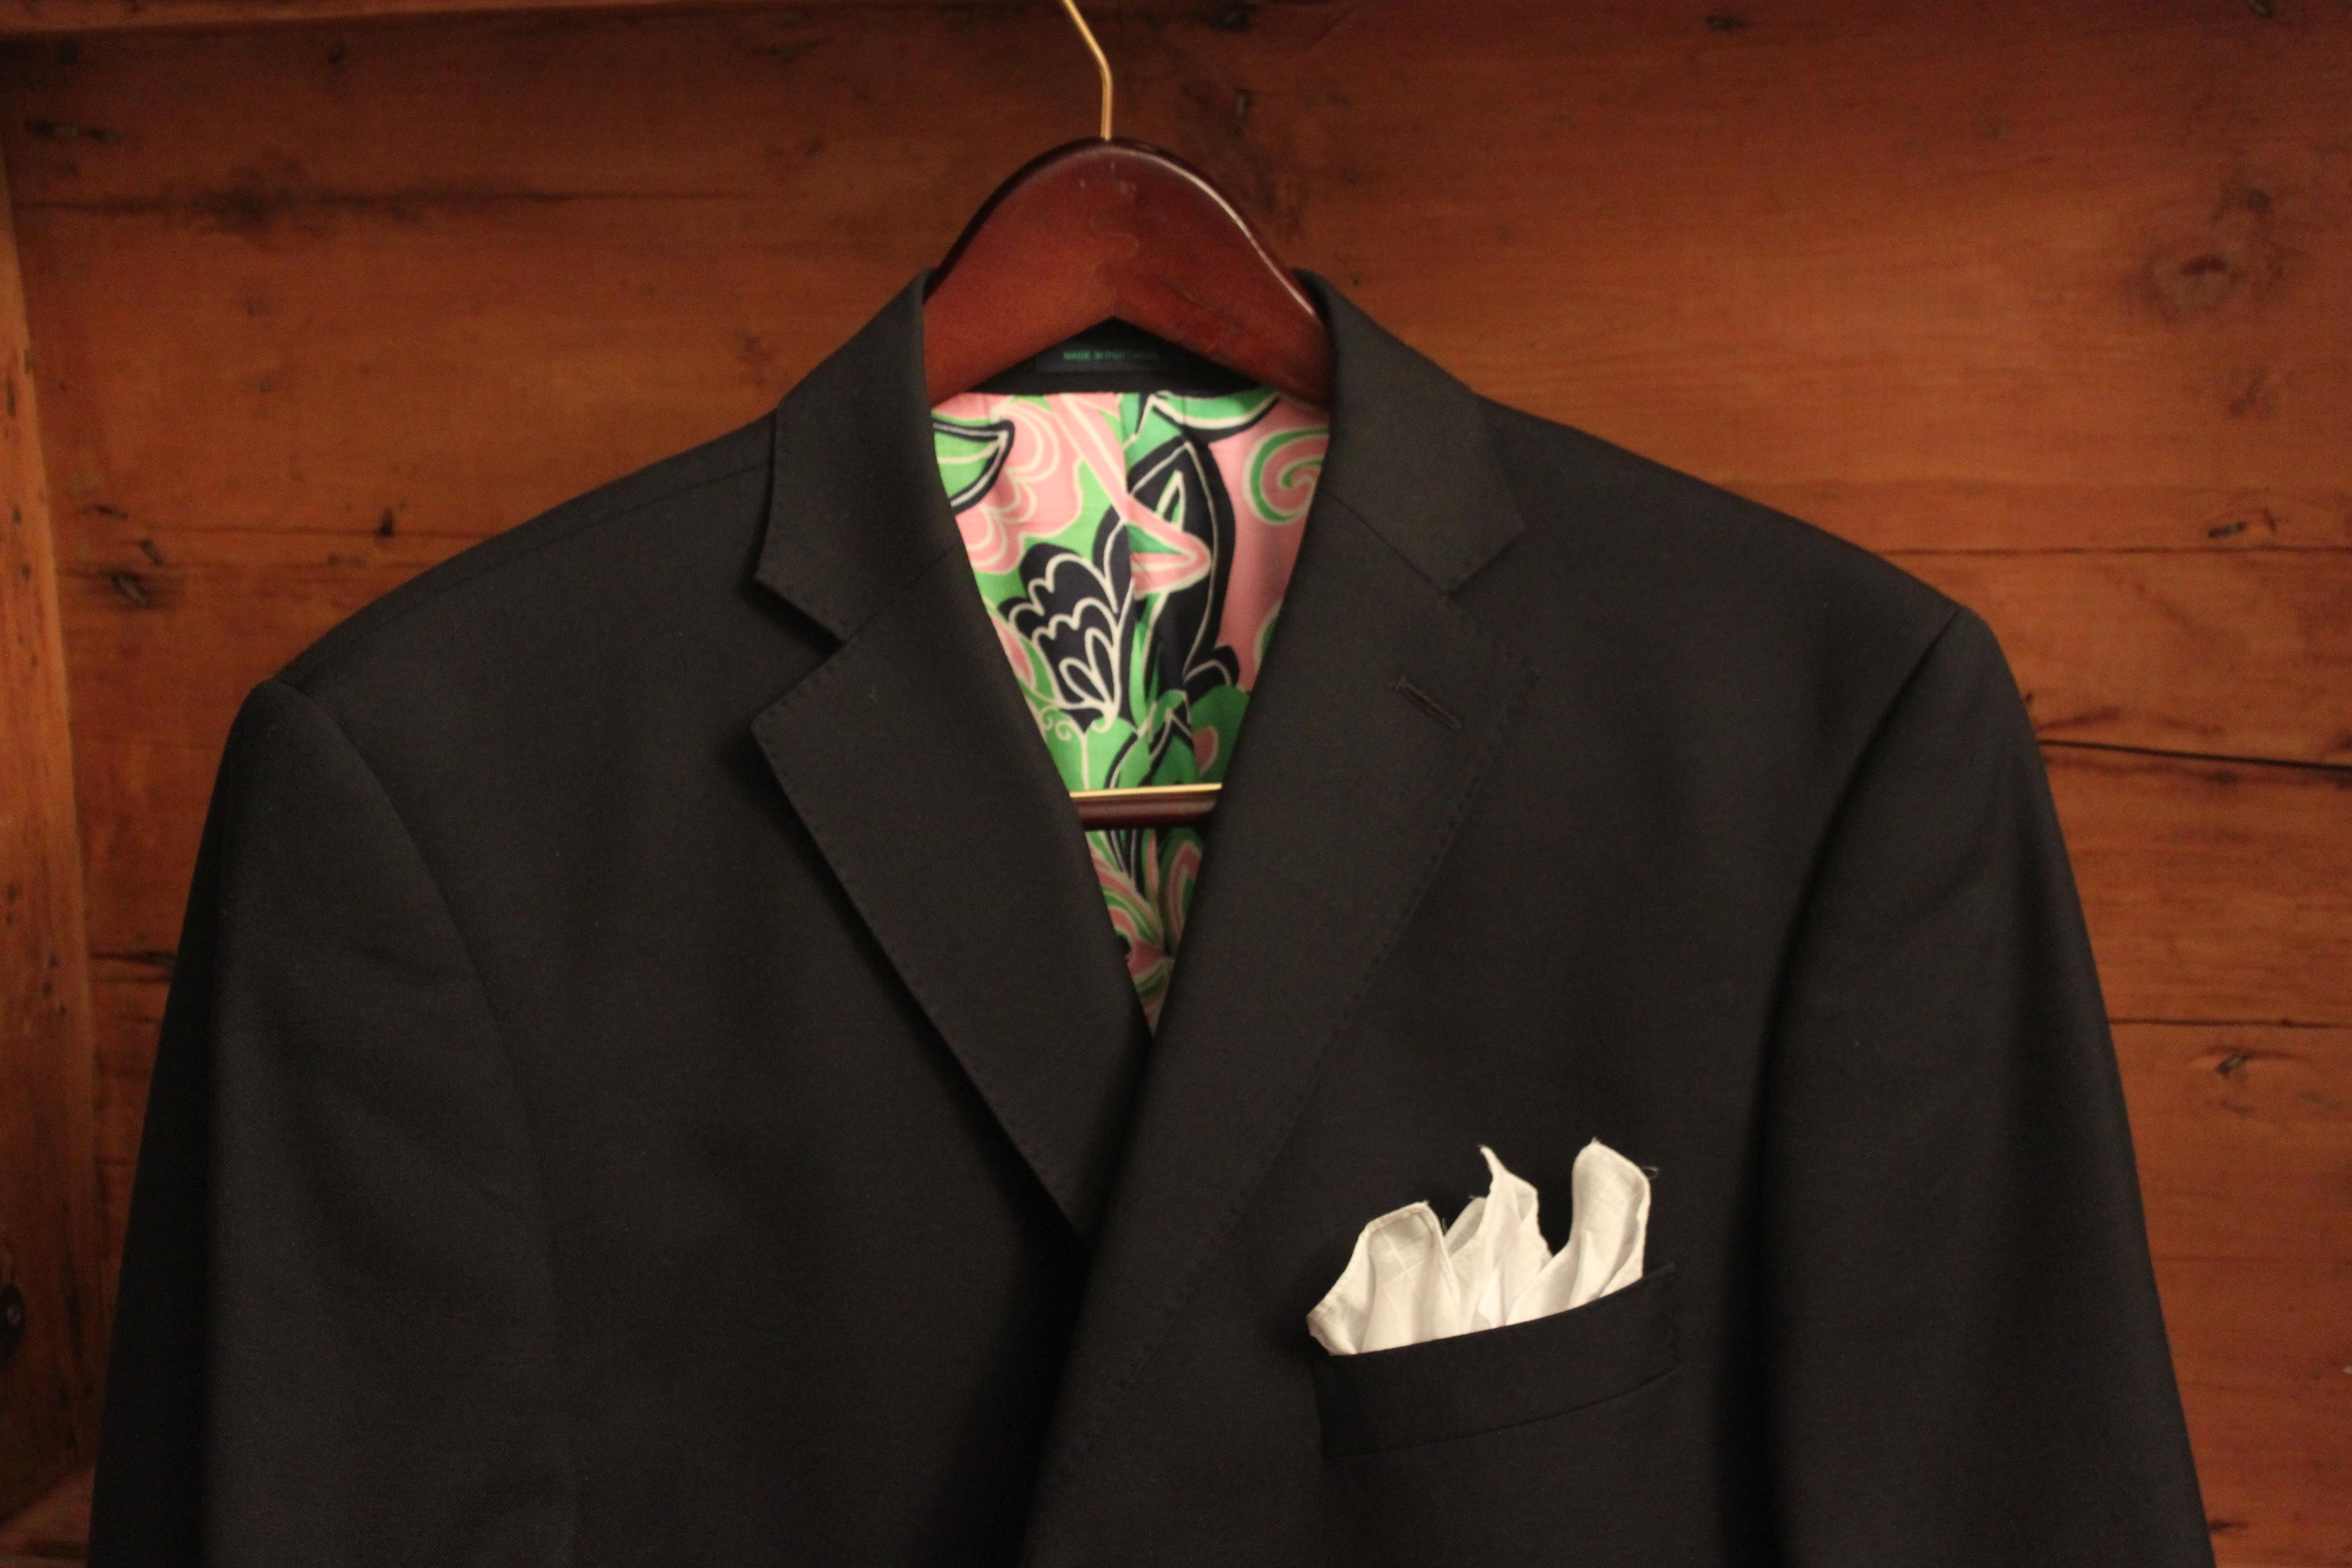 Mens jacket pocket handkerchief - Handkerchief Brooks Brothers Blazer Lilly Pulitzer